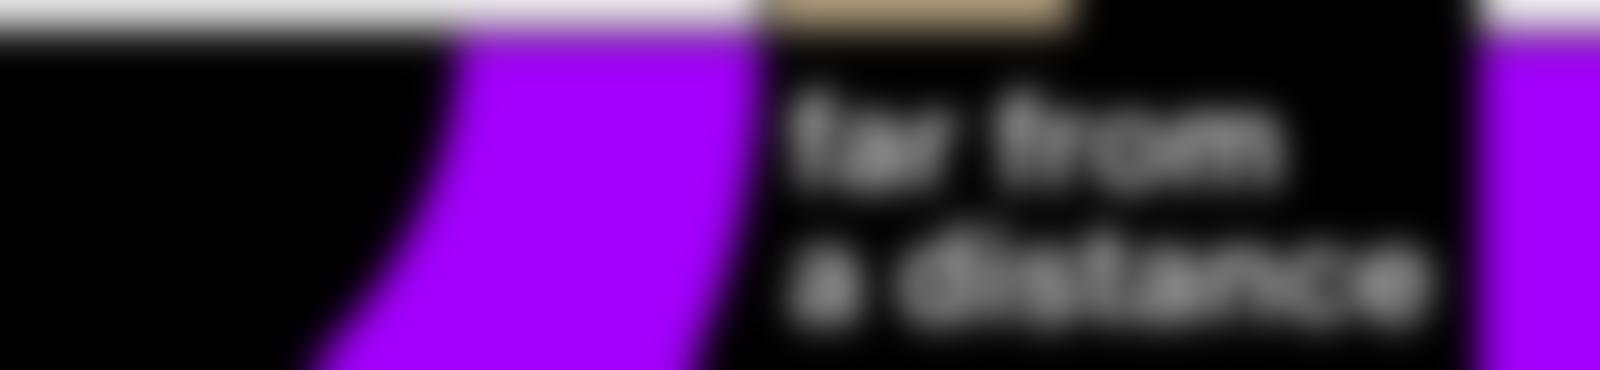 Blurred 425bed12 cd67 40c9 8830 f40edcb72435